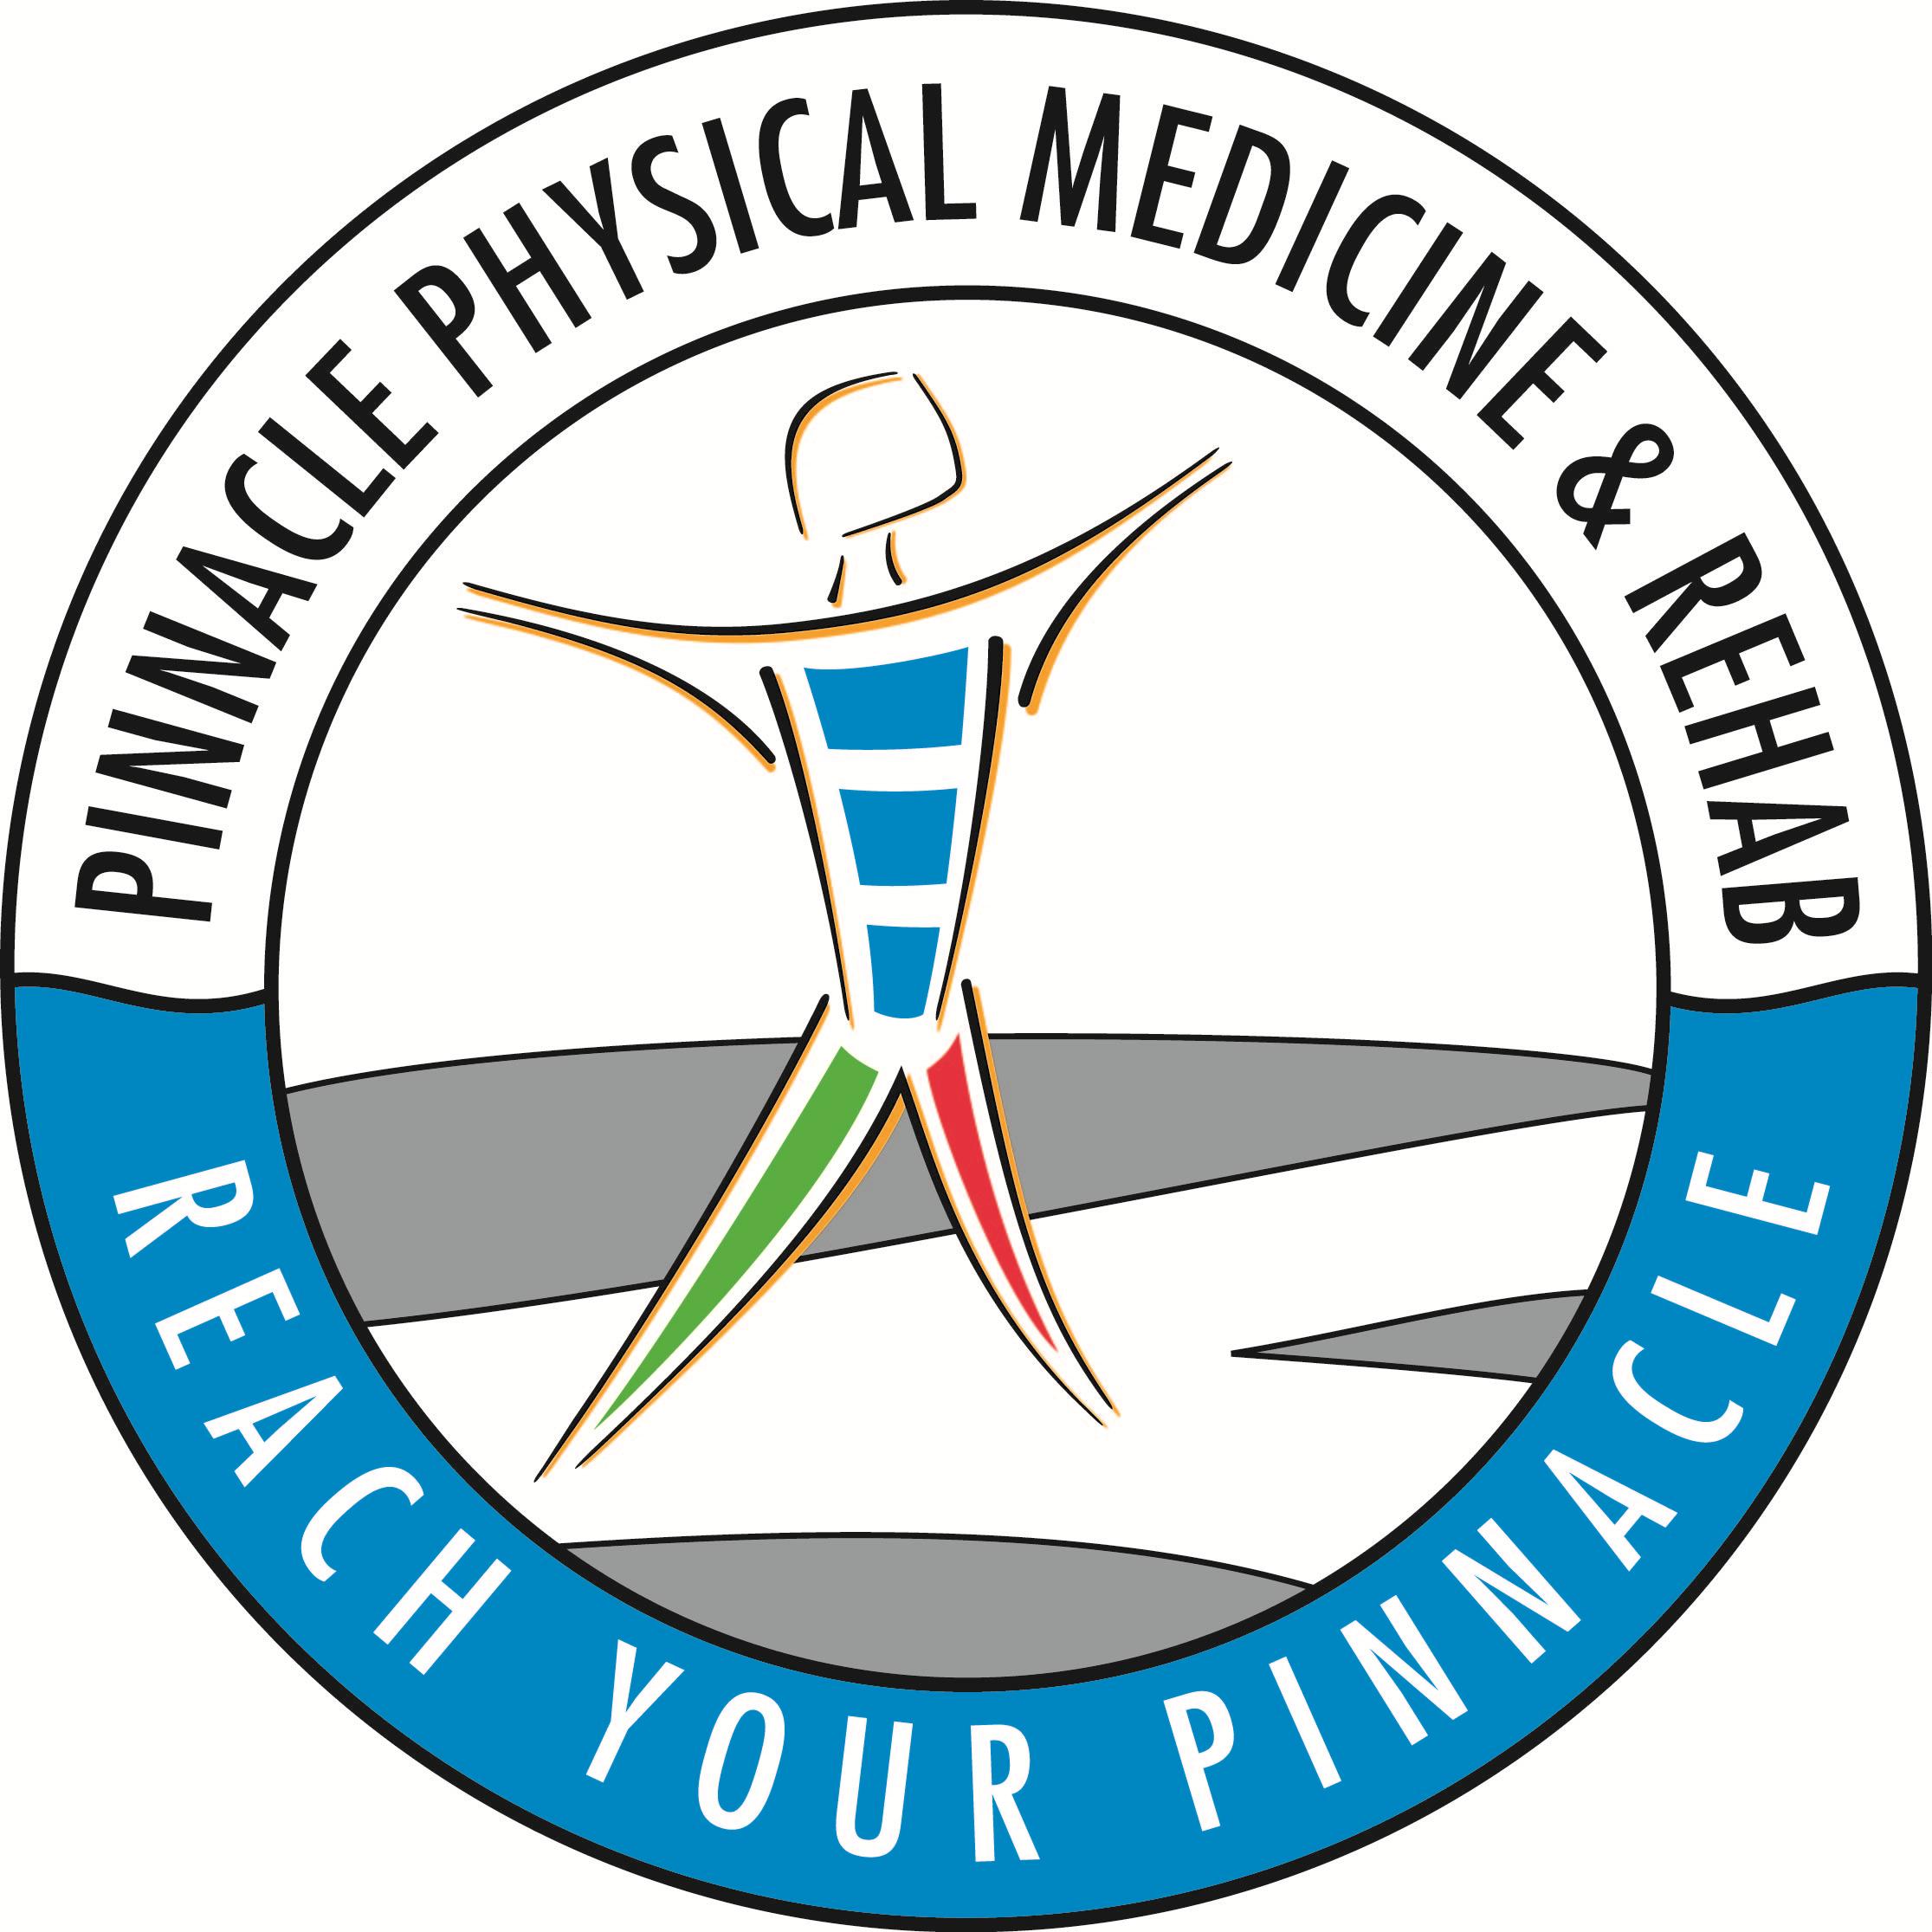 Pinnacle Phys. Med. & Rehab